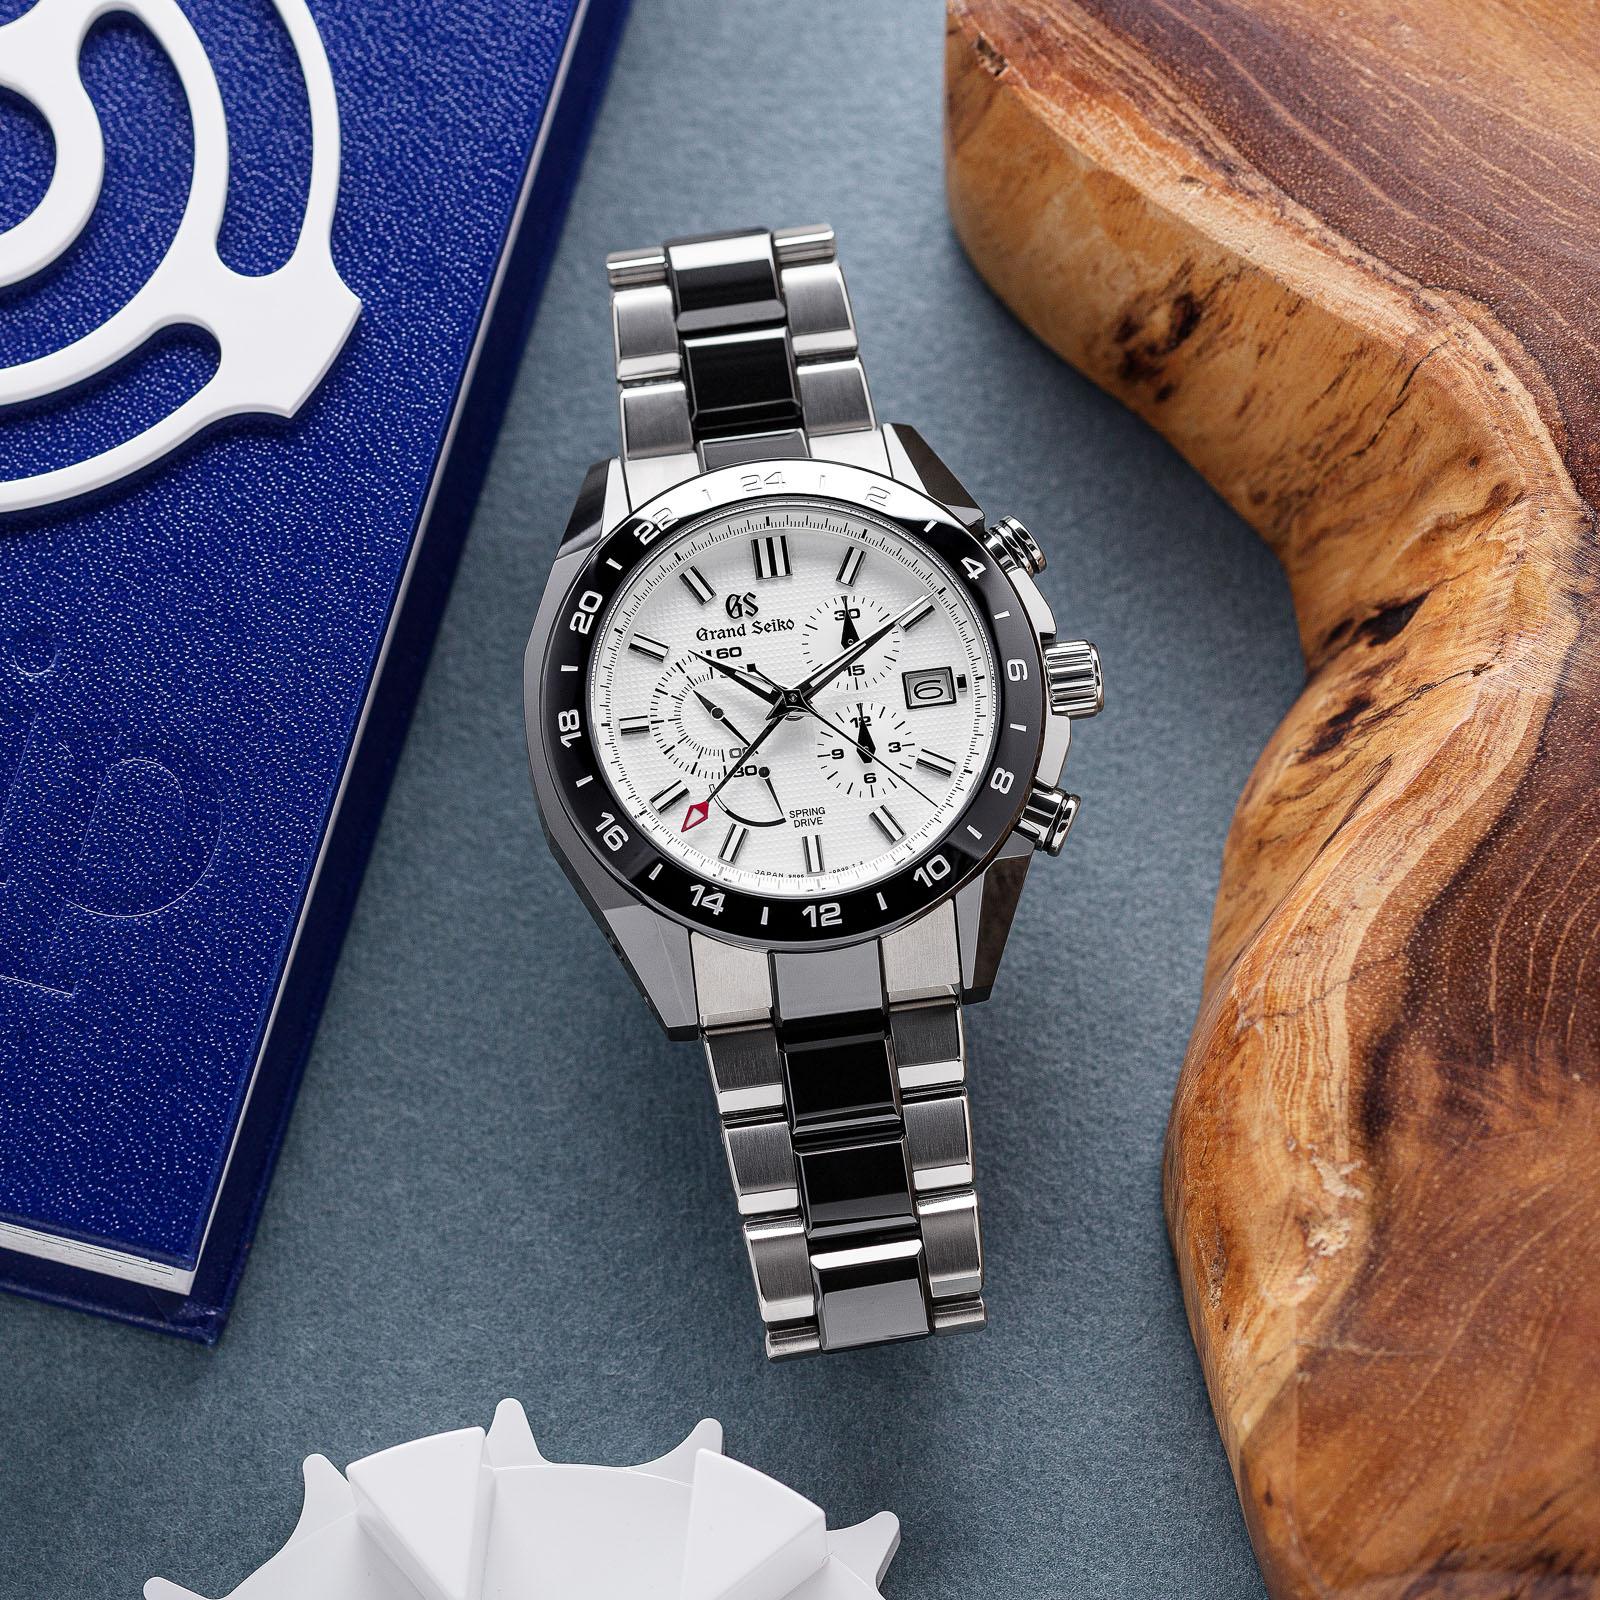 Grand Seiko SBGC221 Chronograph - white dial wristwatch with a titanium and ceramic case.